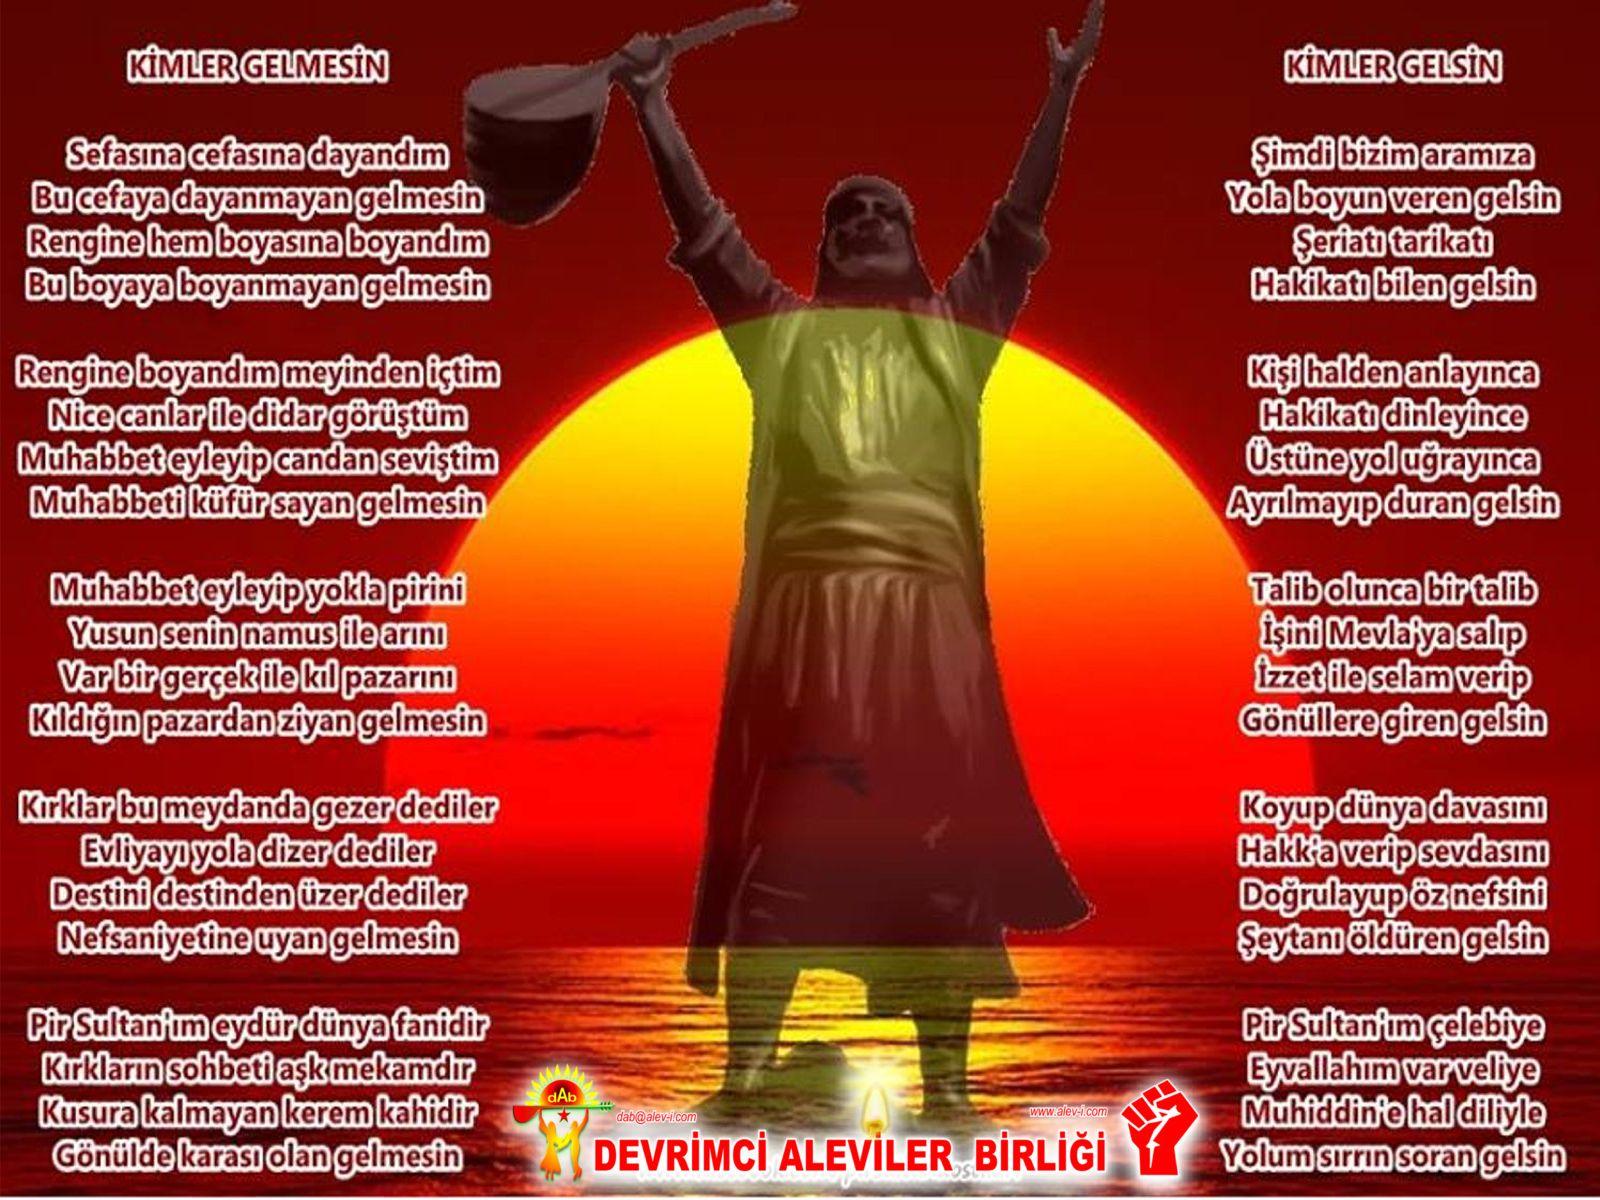 Alevi Bektaşi Kızılbaş Pir Sultan Devrimci Aleviler Birliği DAB devrimci Aleviler birligi gelsin gelmesin pirsultan